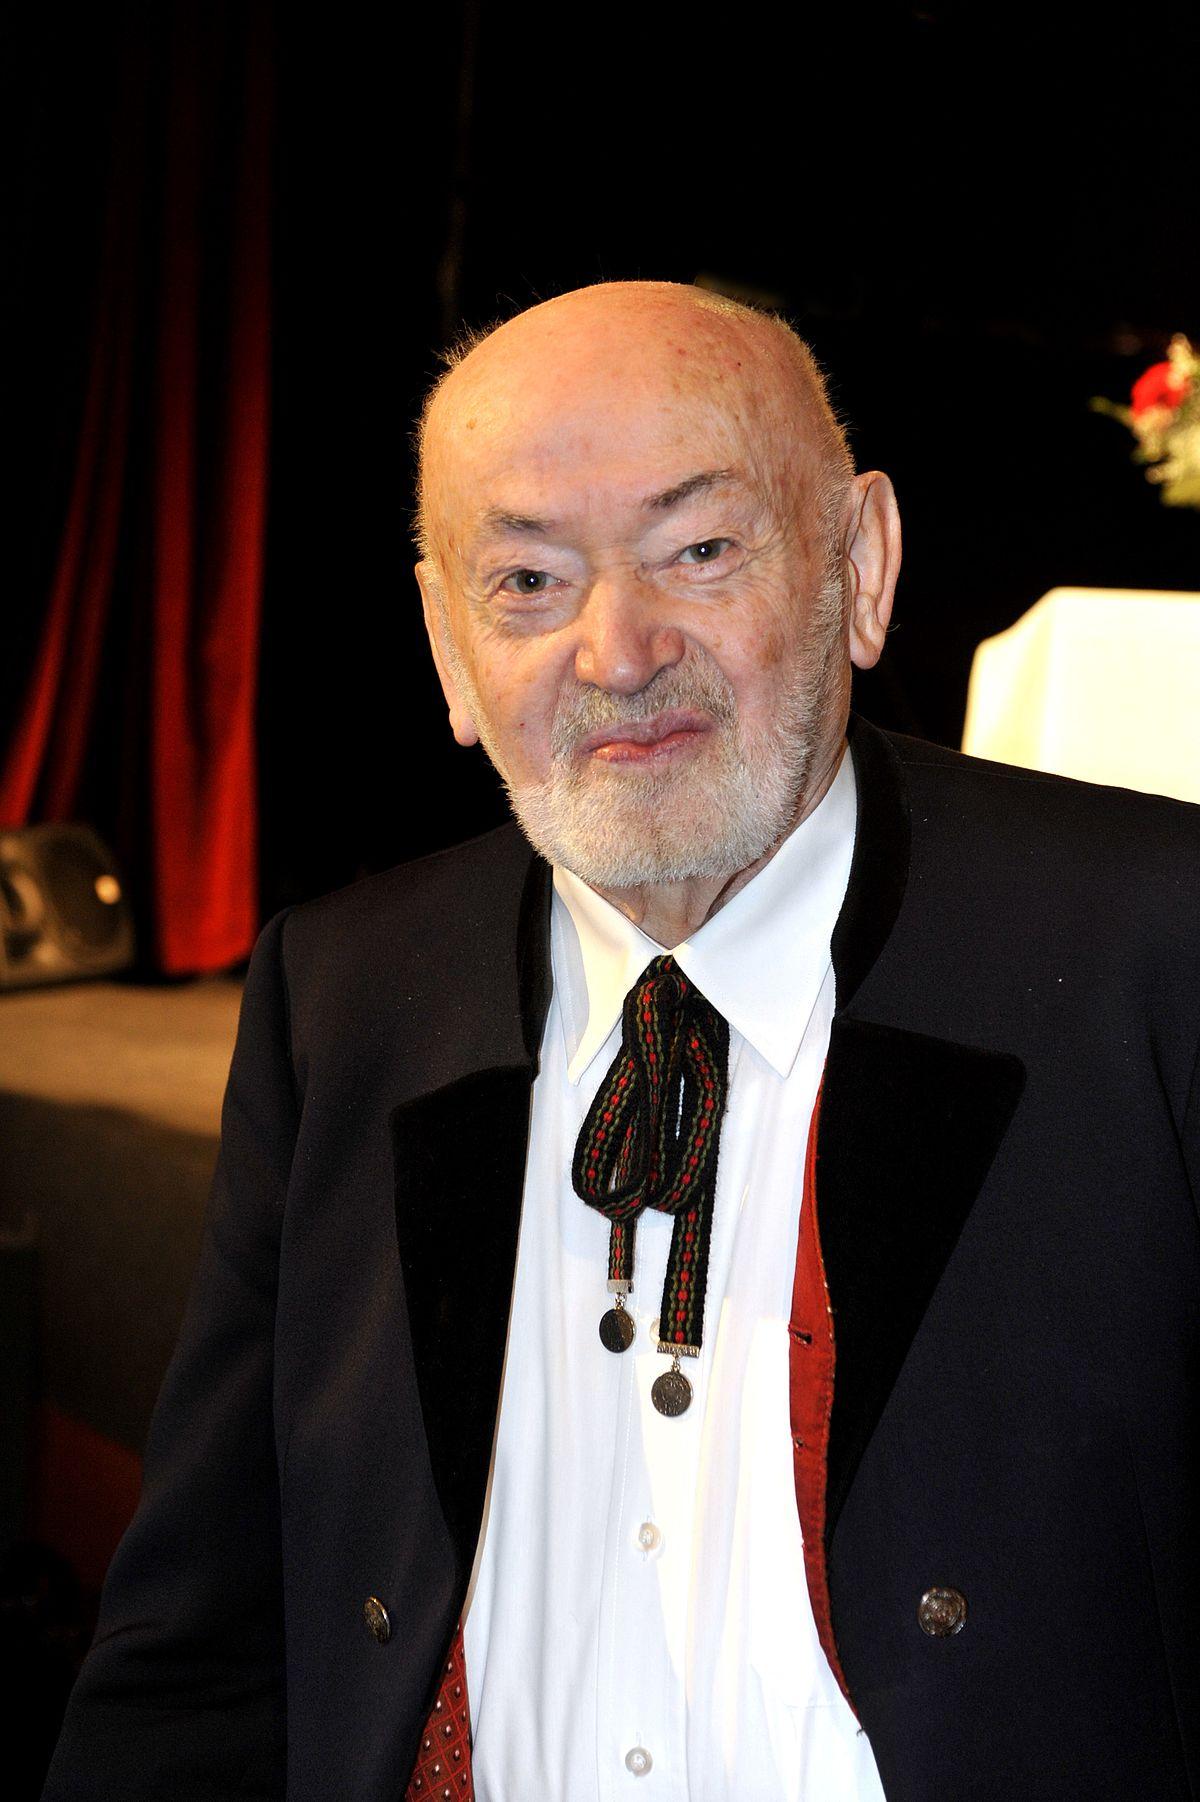 Josef Fendl